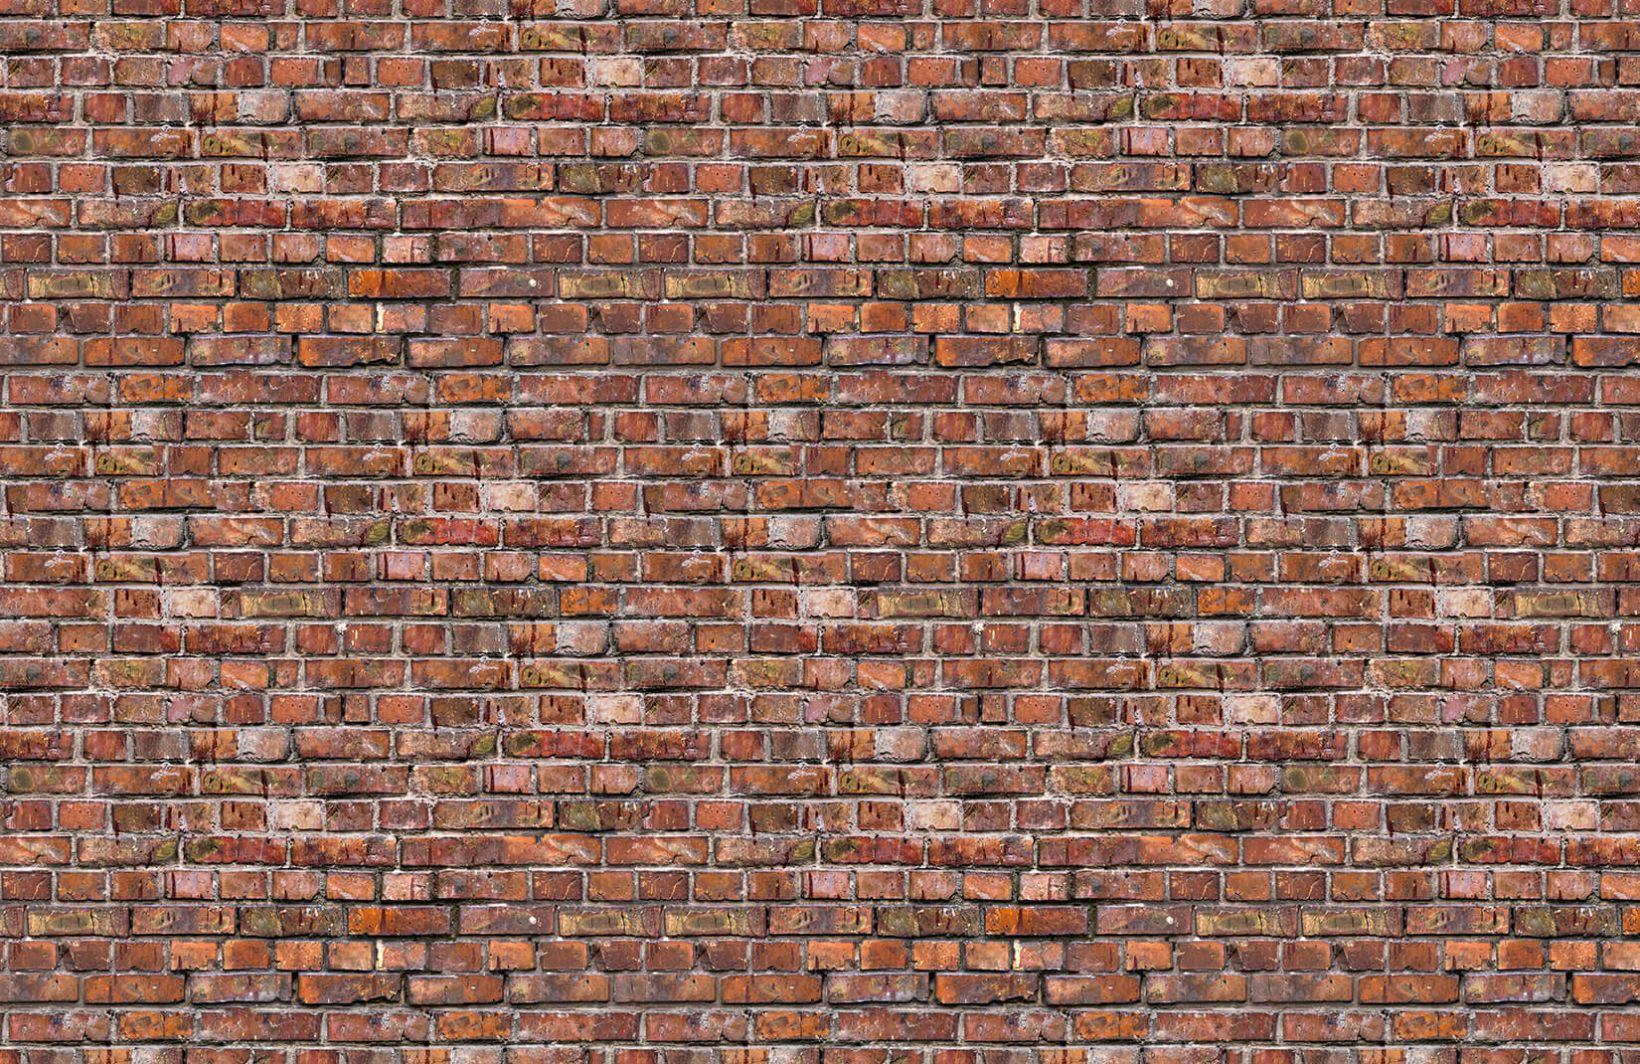 Red Brick Effect Wallpaper Aged Brick Wall Muralswallpaper Brick Wallpaper Brick Wallpaper Mural Exposed Brick Wallpaper